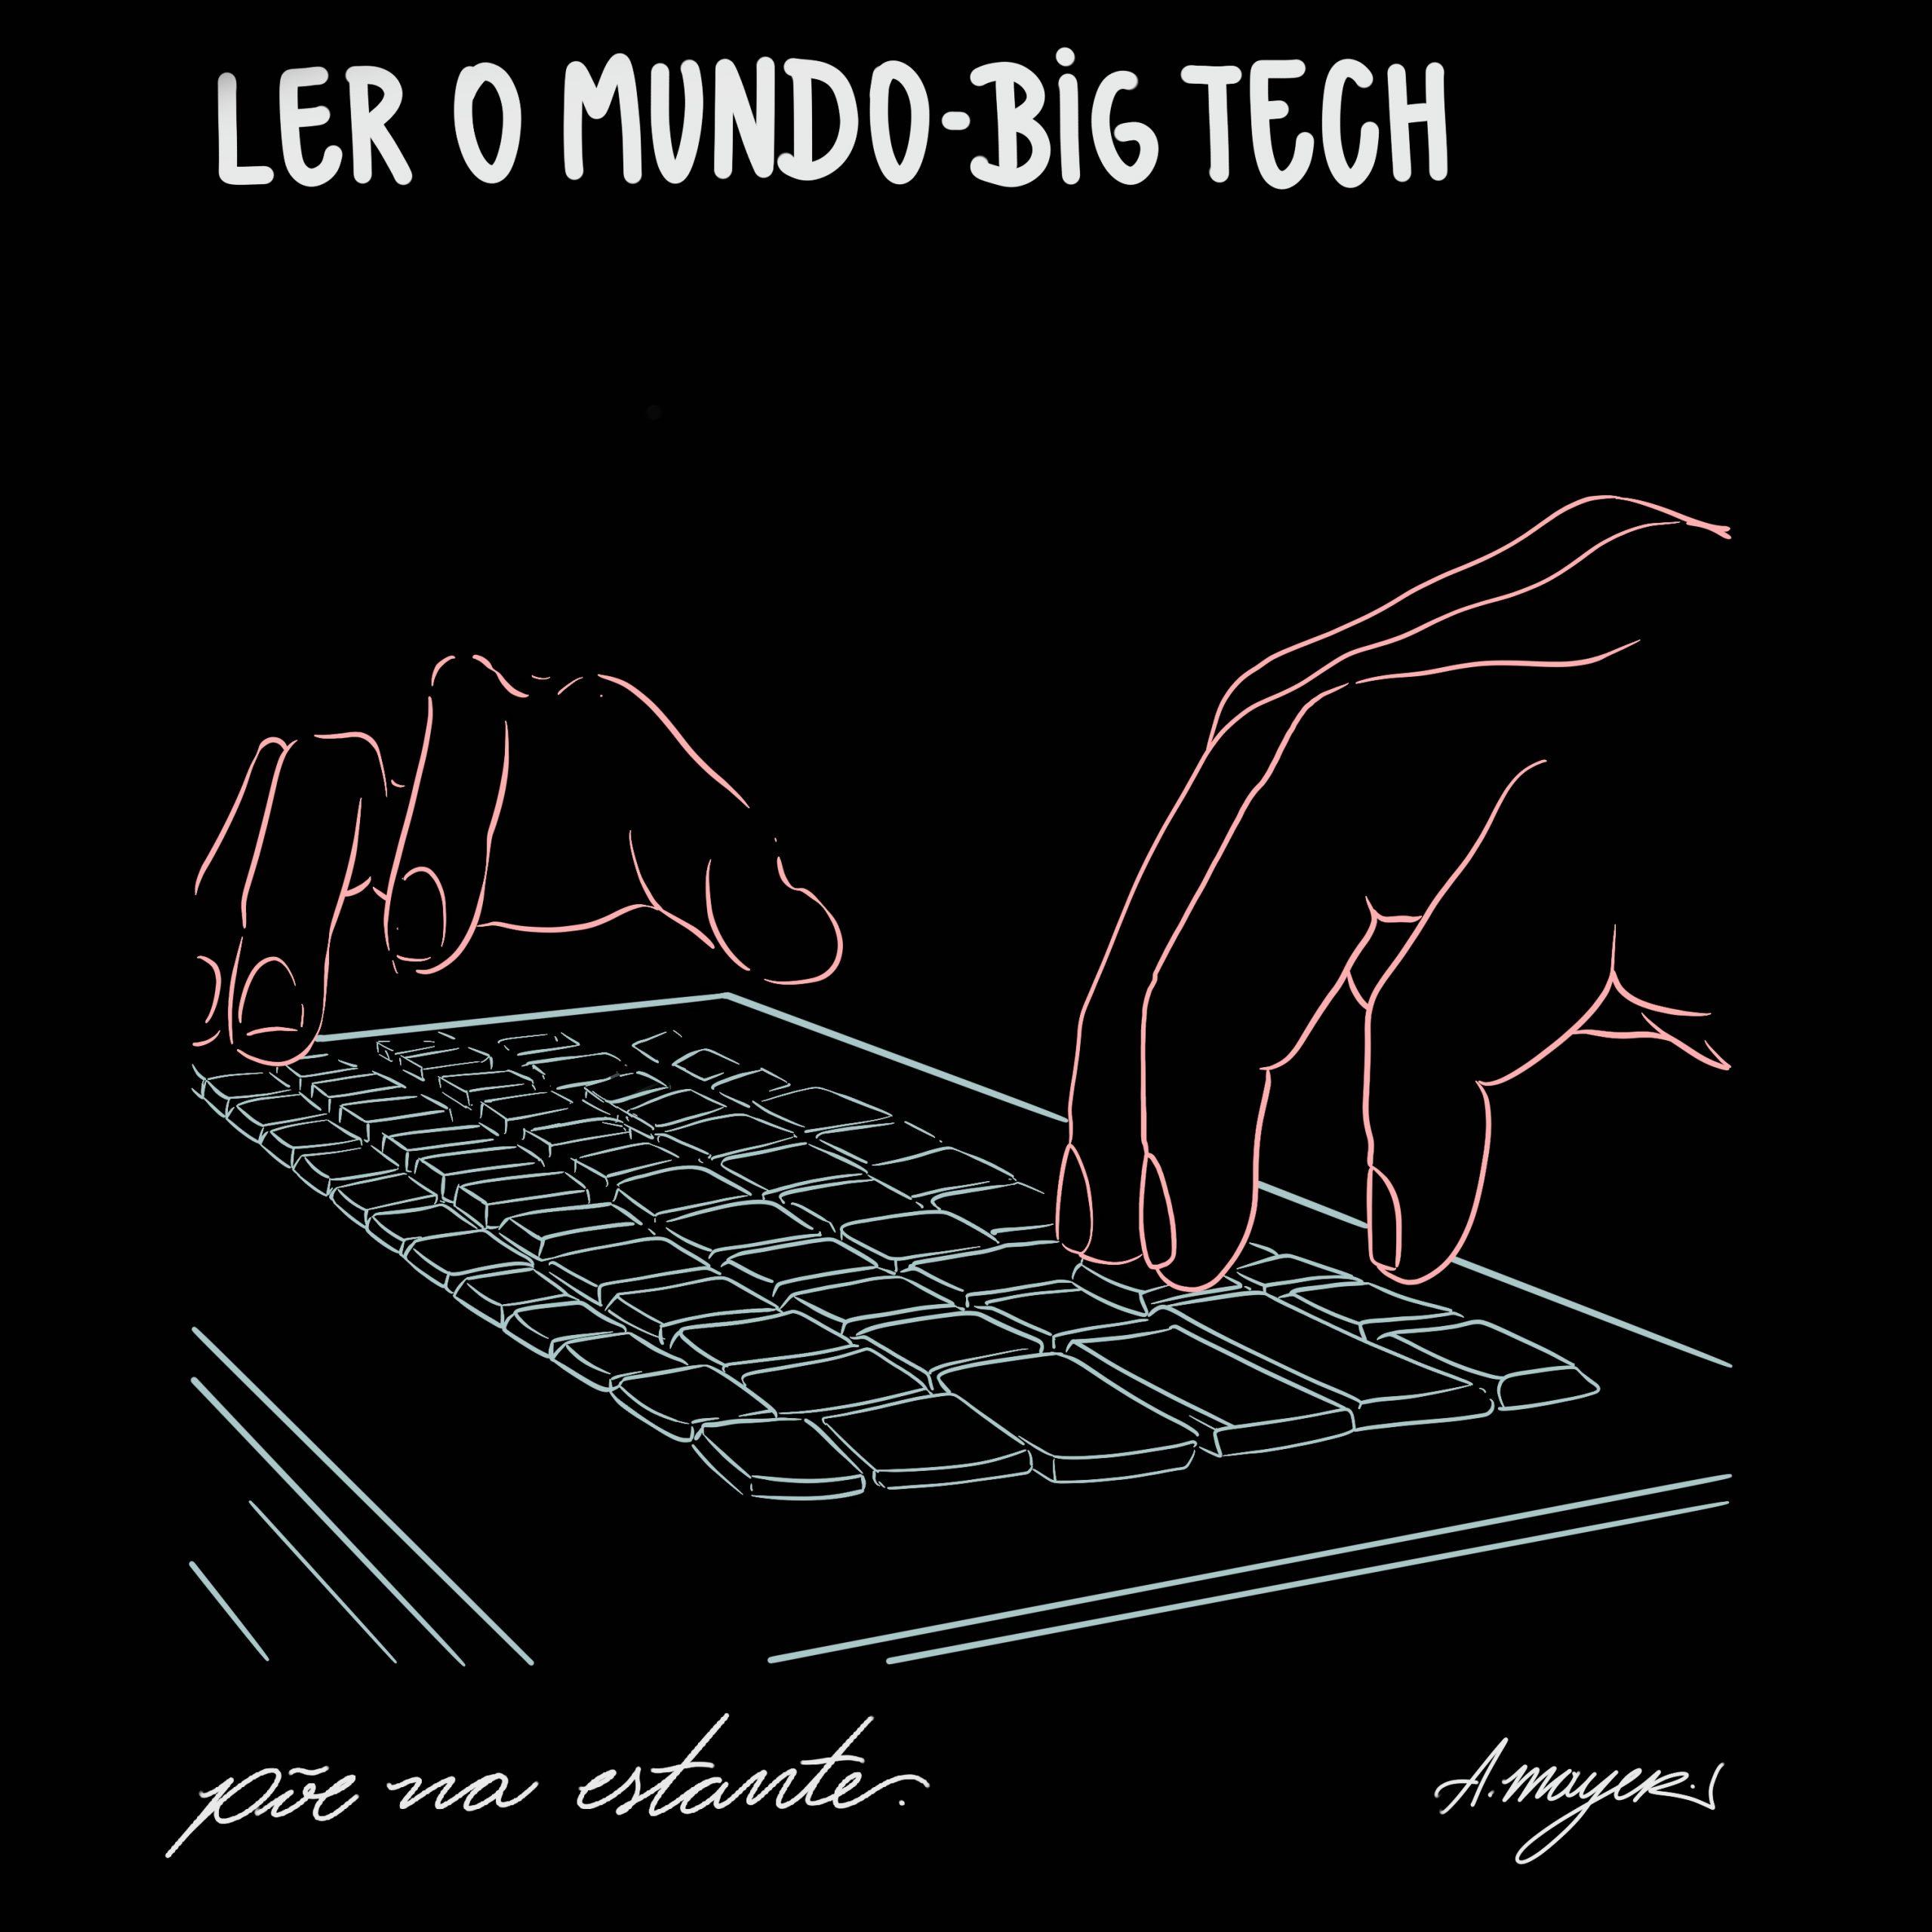 Capa - Big Tech, de Evgeny Morozov